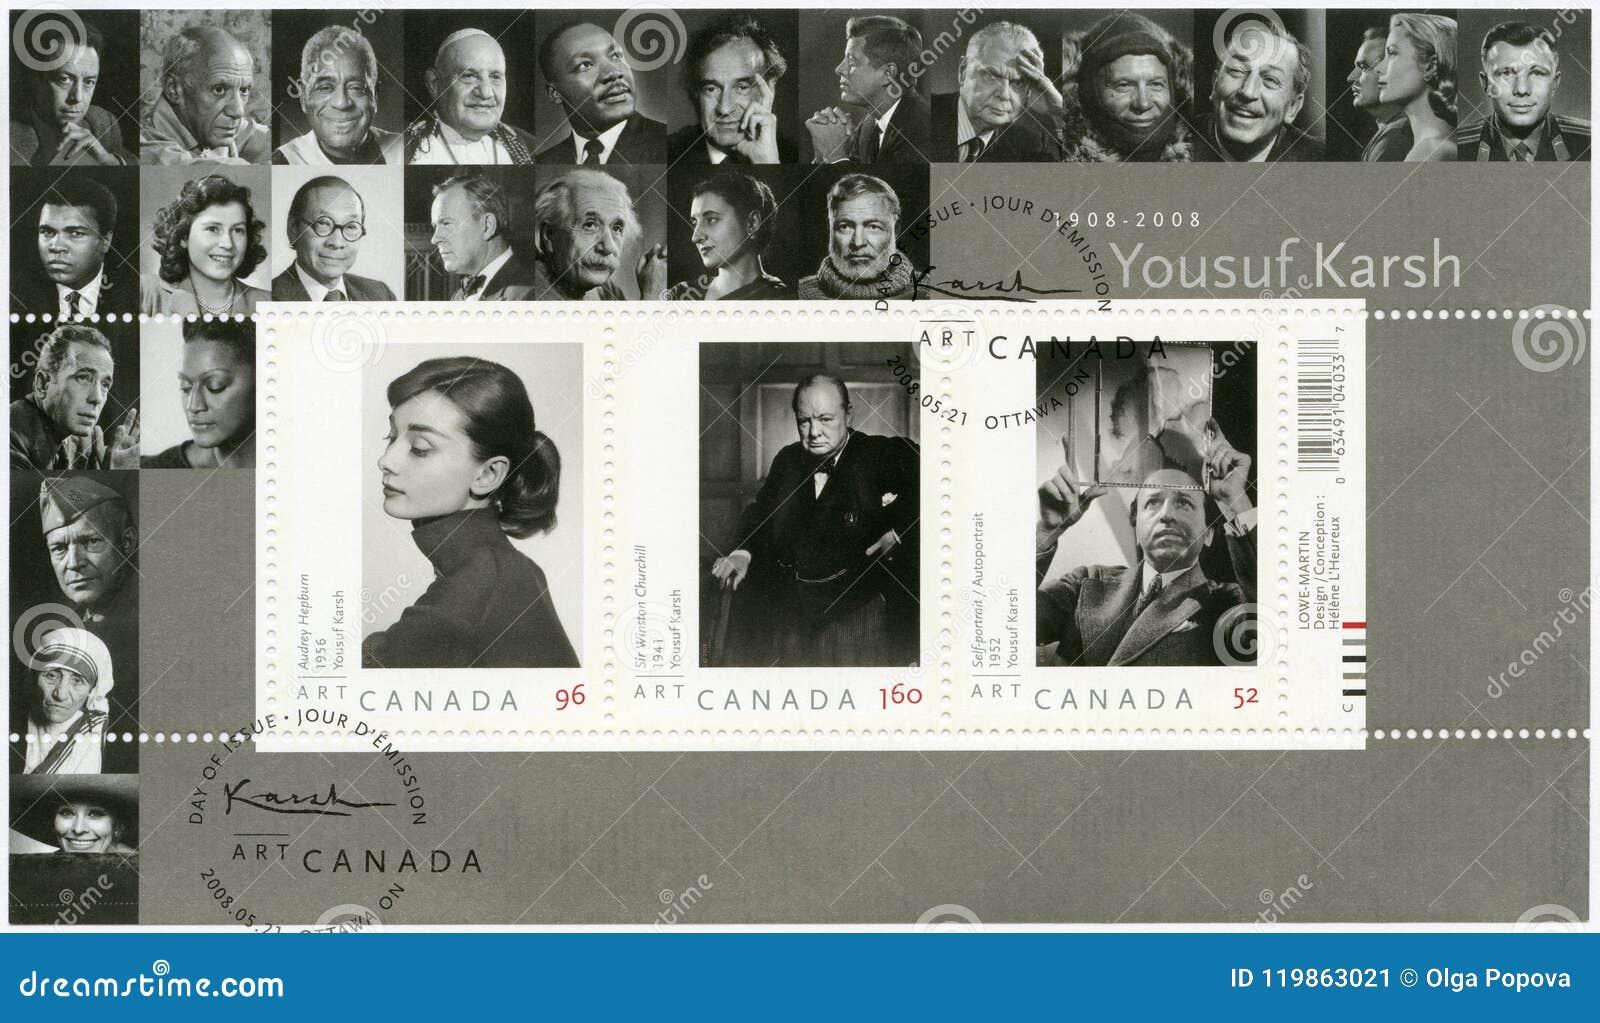 KANADA - 2008: przedstawienia Audrey Hepburn 1929-1993, Sir Winston Churchill i autoportret Yousuf Karsh 1908-2002, 1874-1965,